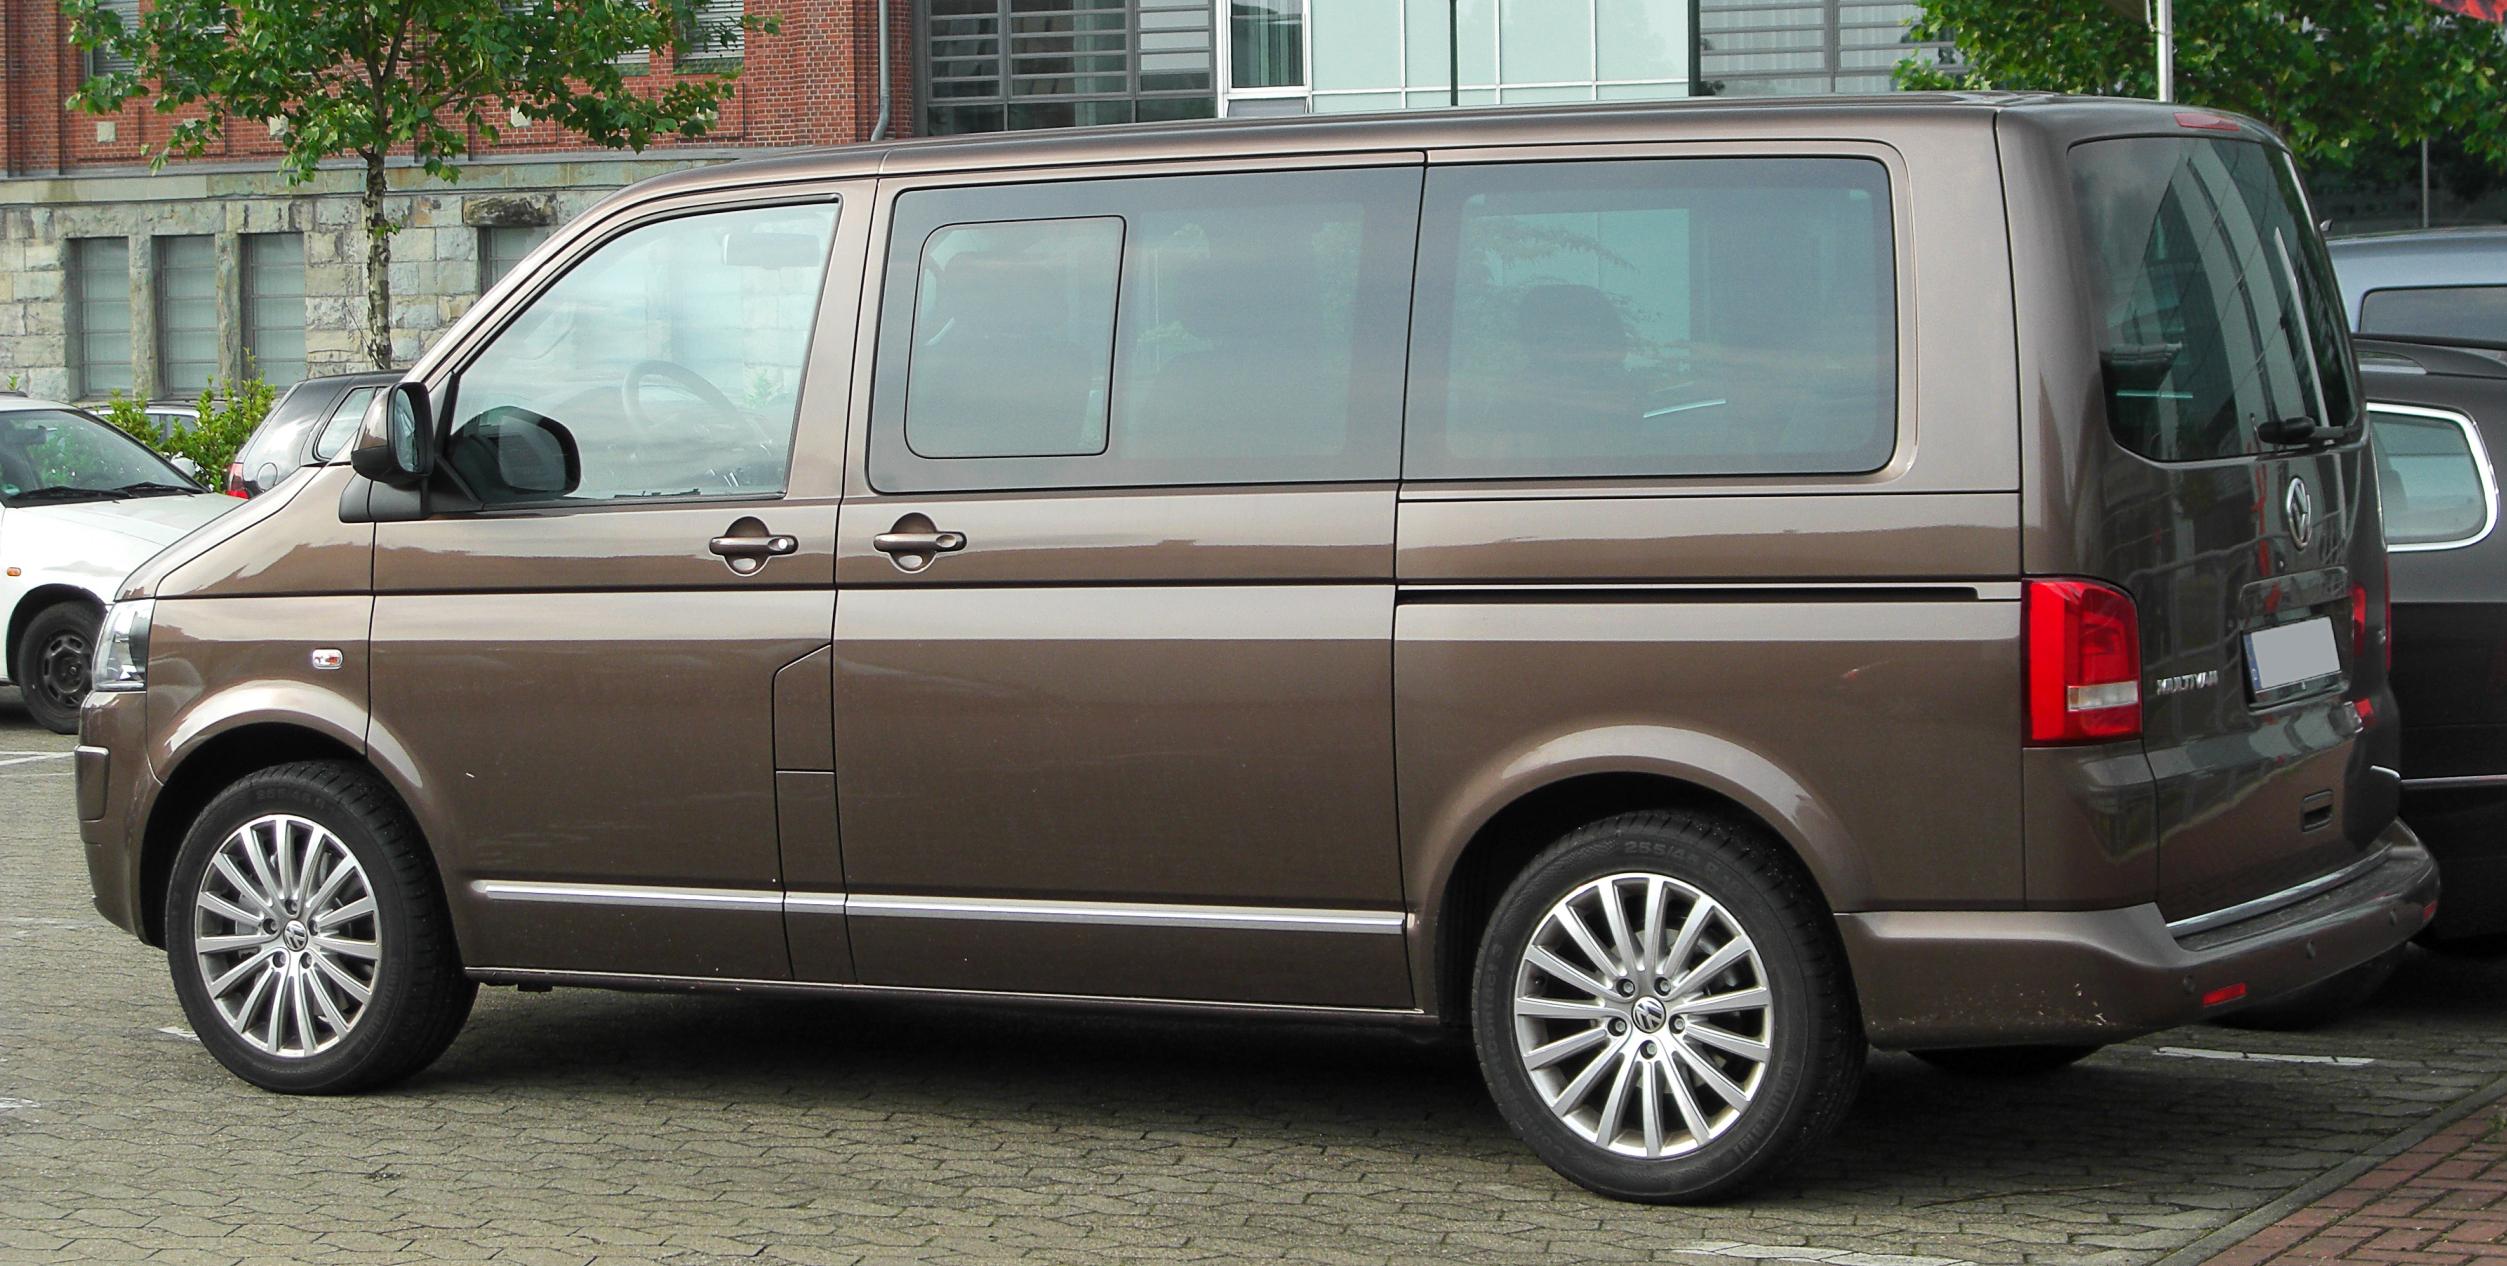 Full Size Van >> VW Multivan #11 - high quality VW Multivan pictures on MotorInfo.org